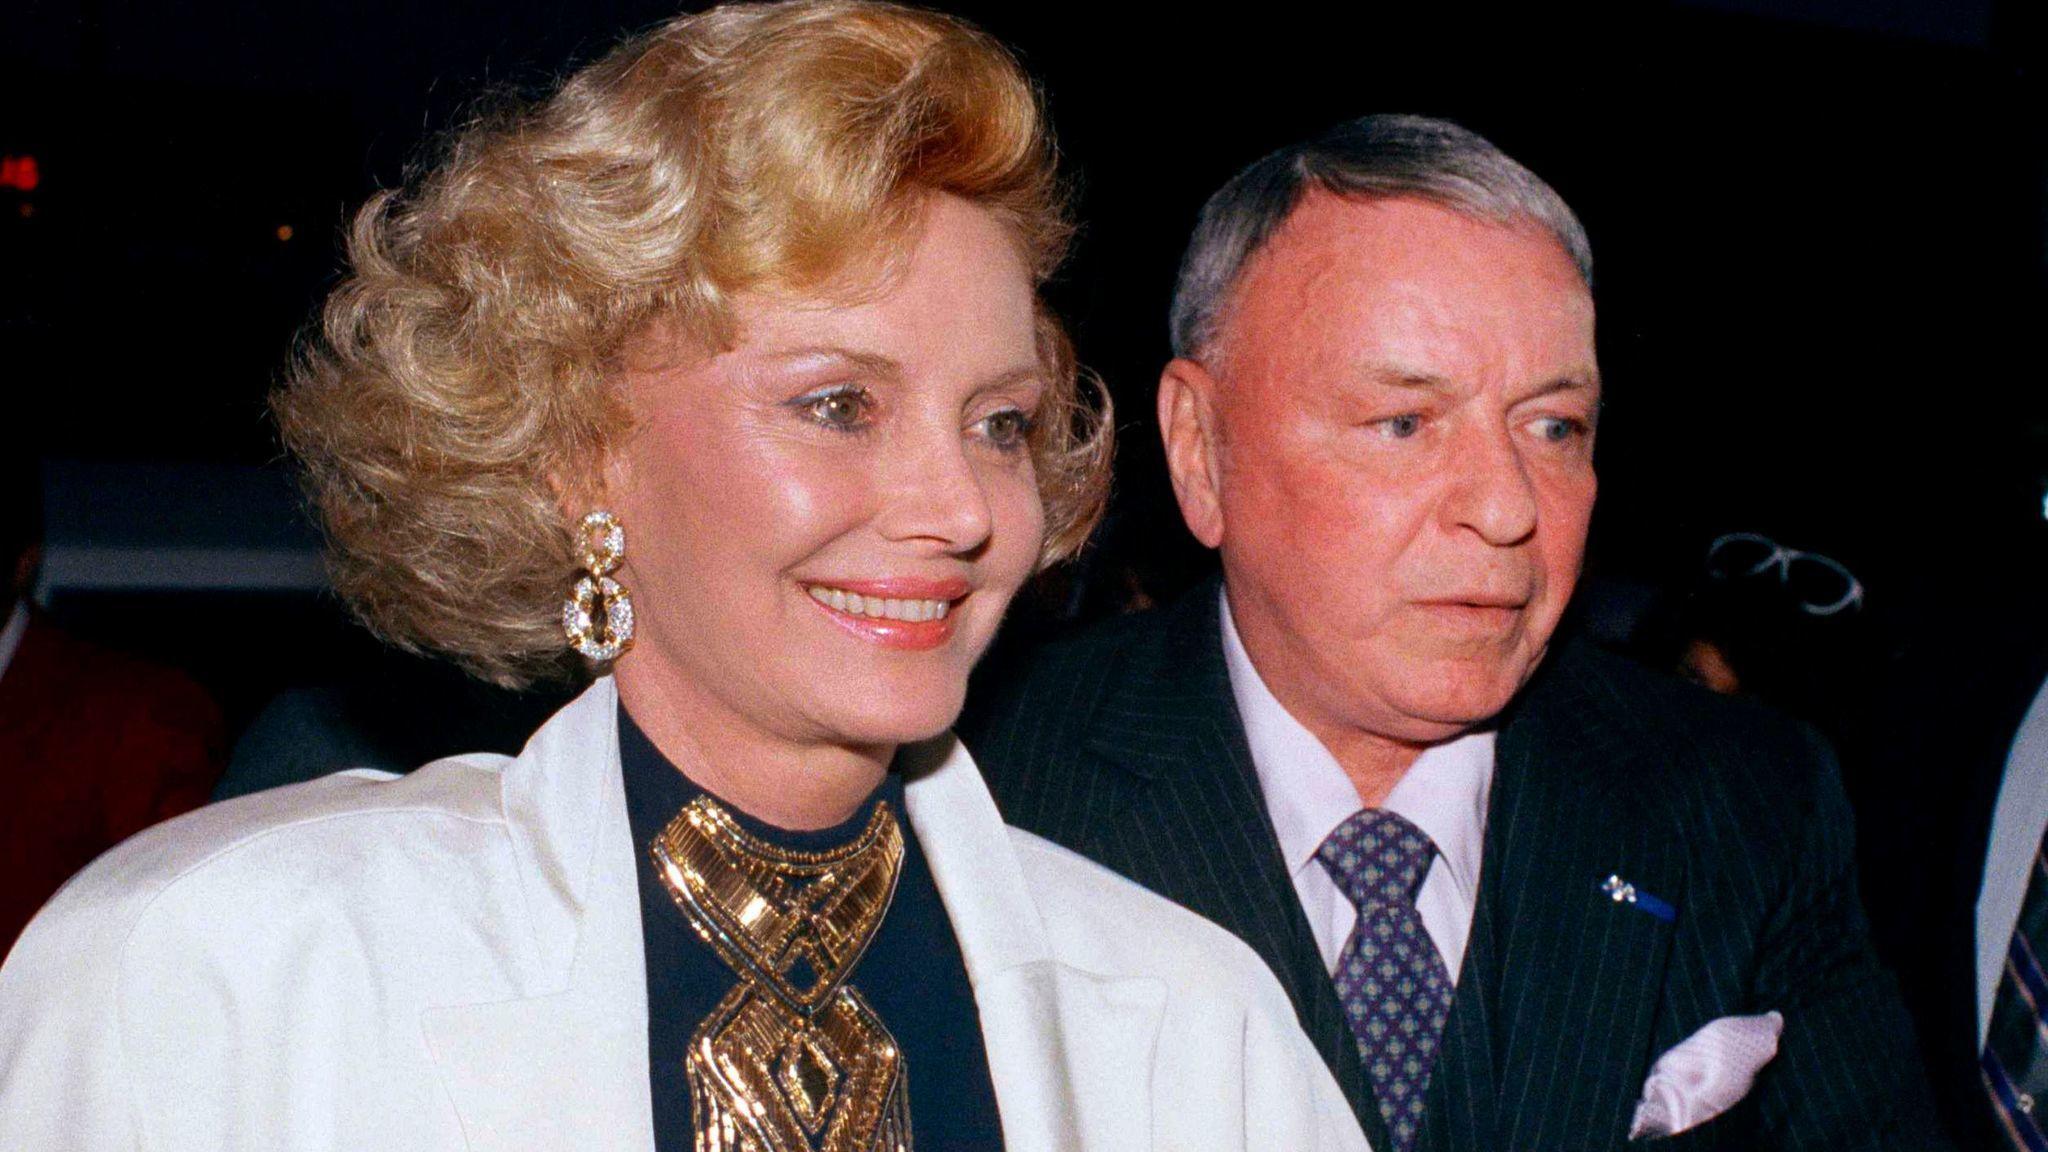 Barbara Sinatra, 1927-2017